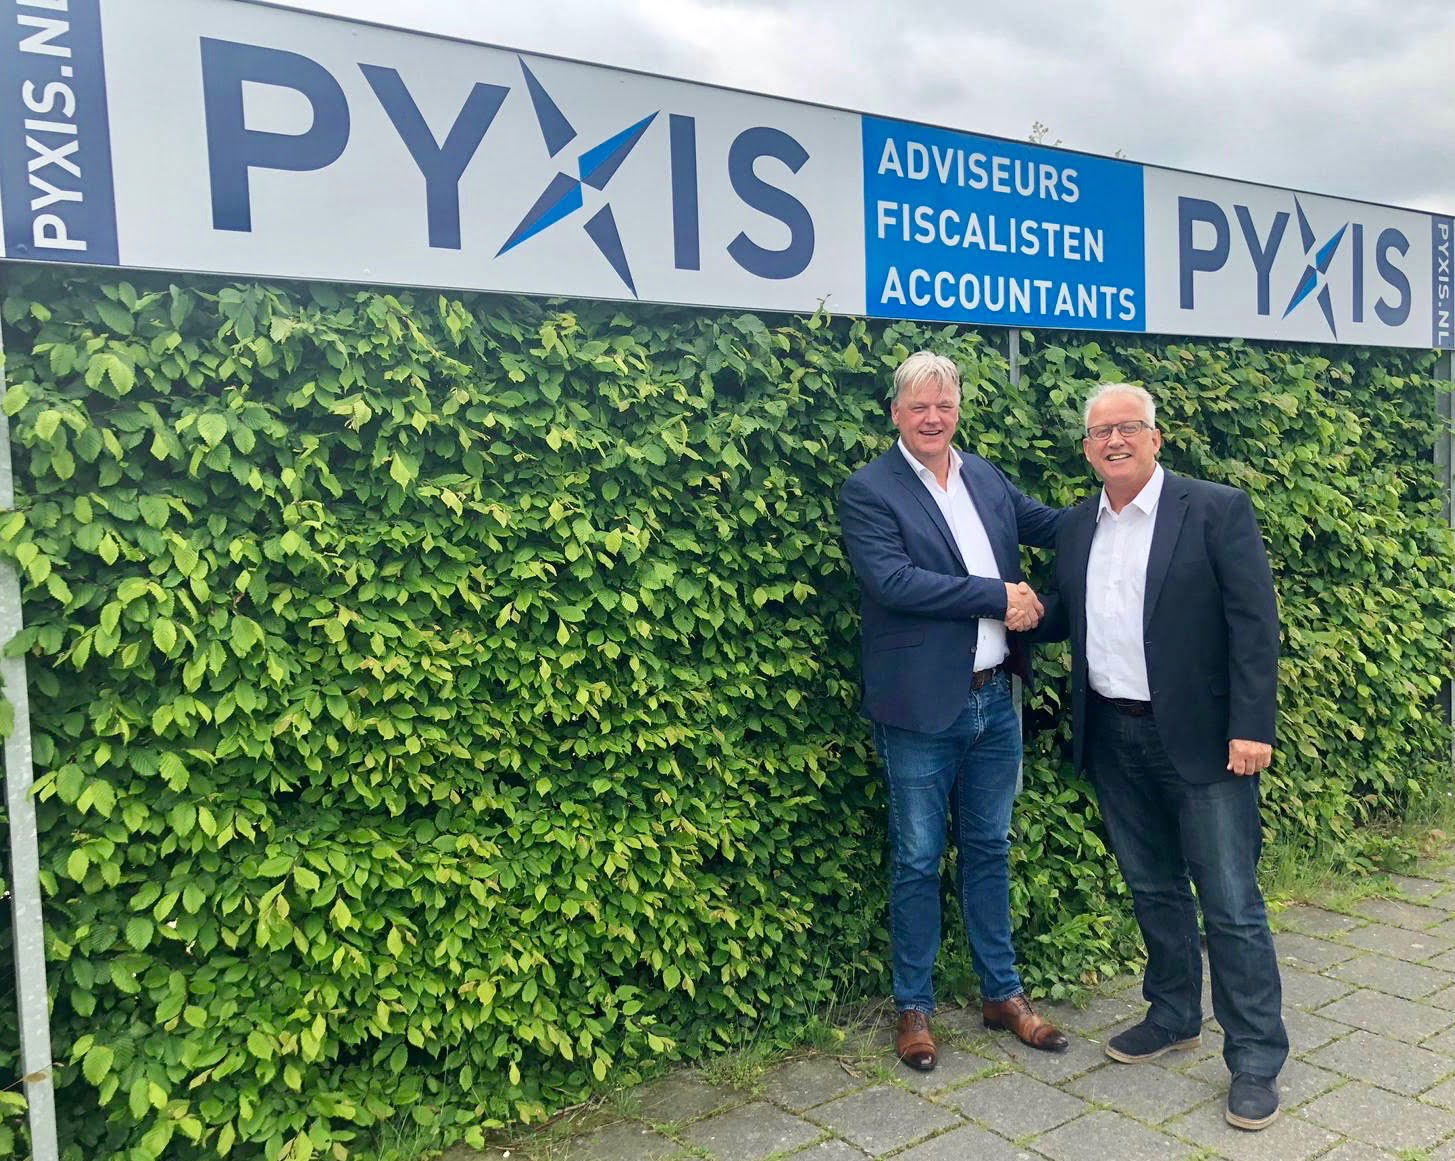 PYXIS sponsort SDO 2019:2020 02